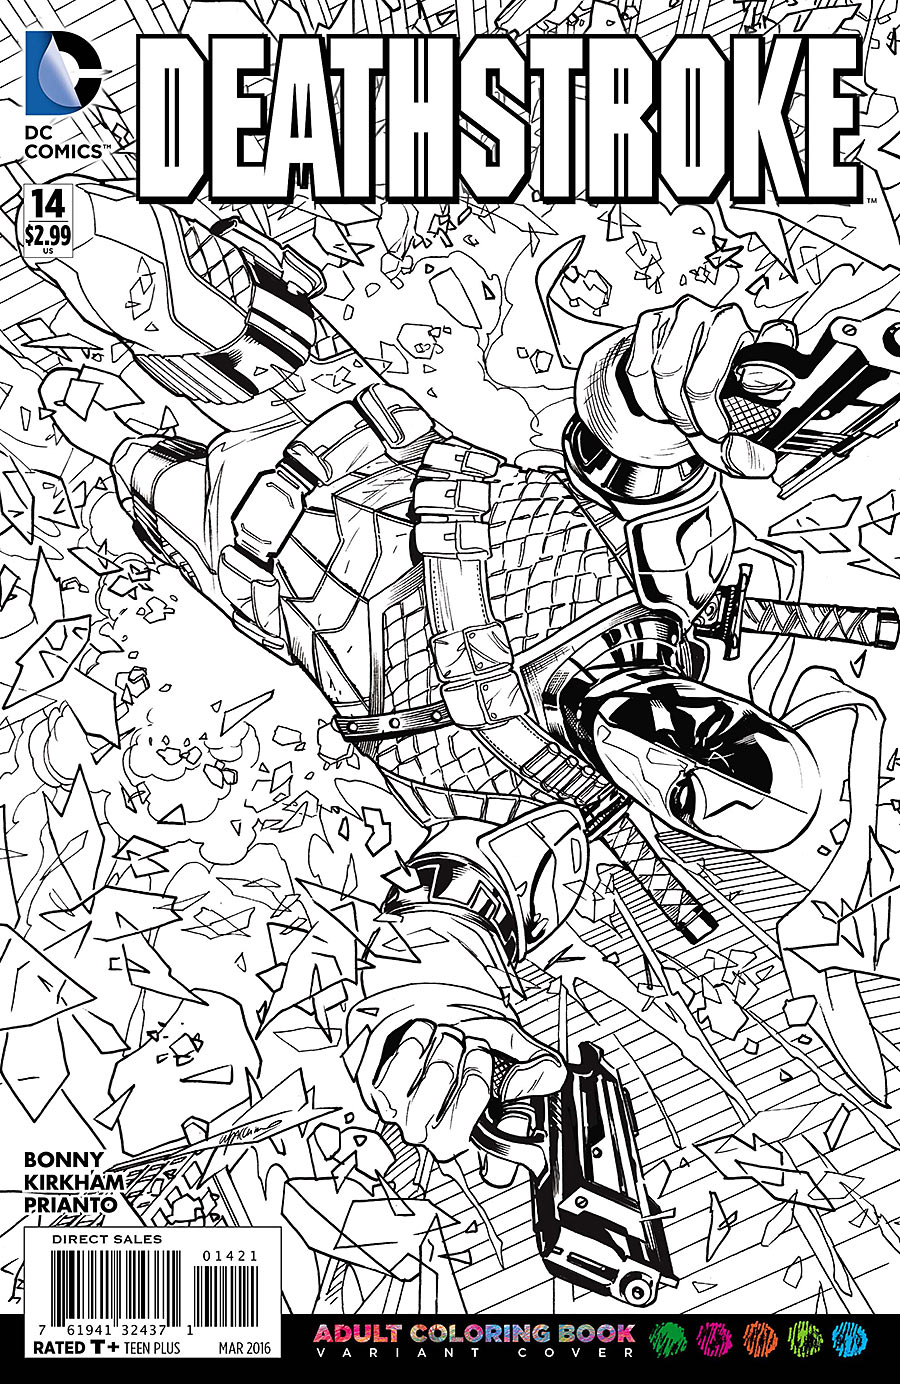 Justice League Coloring Pages #6